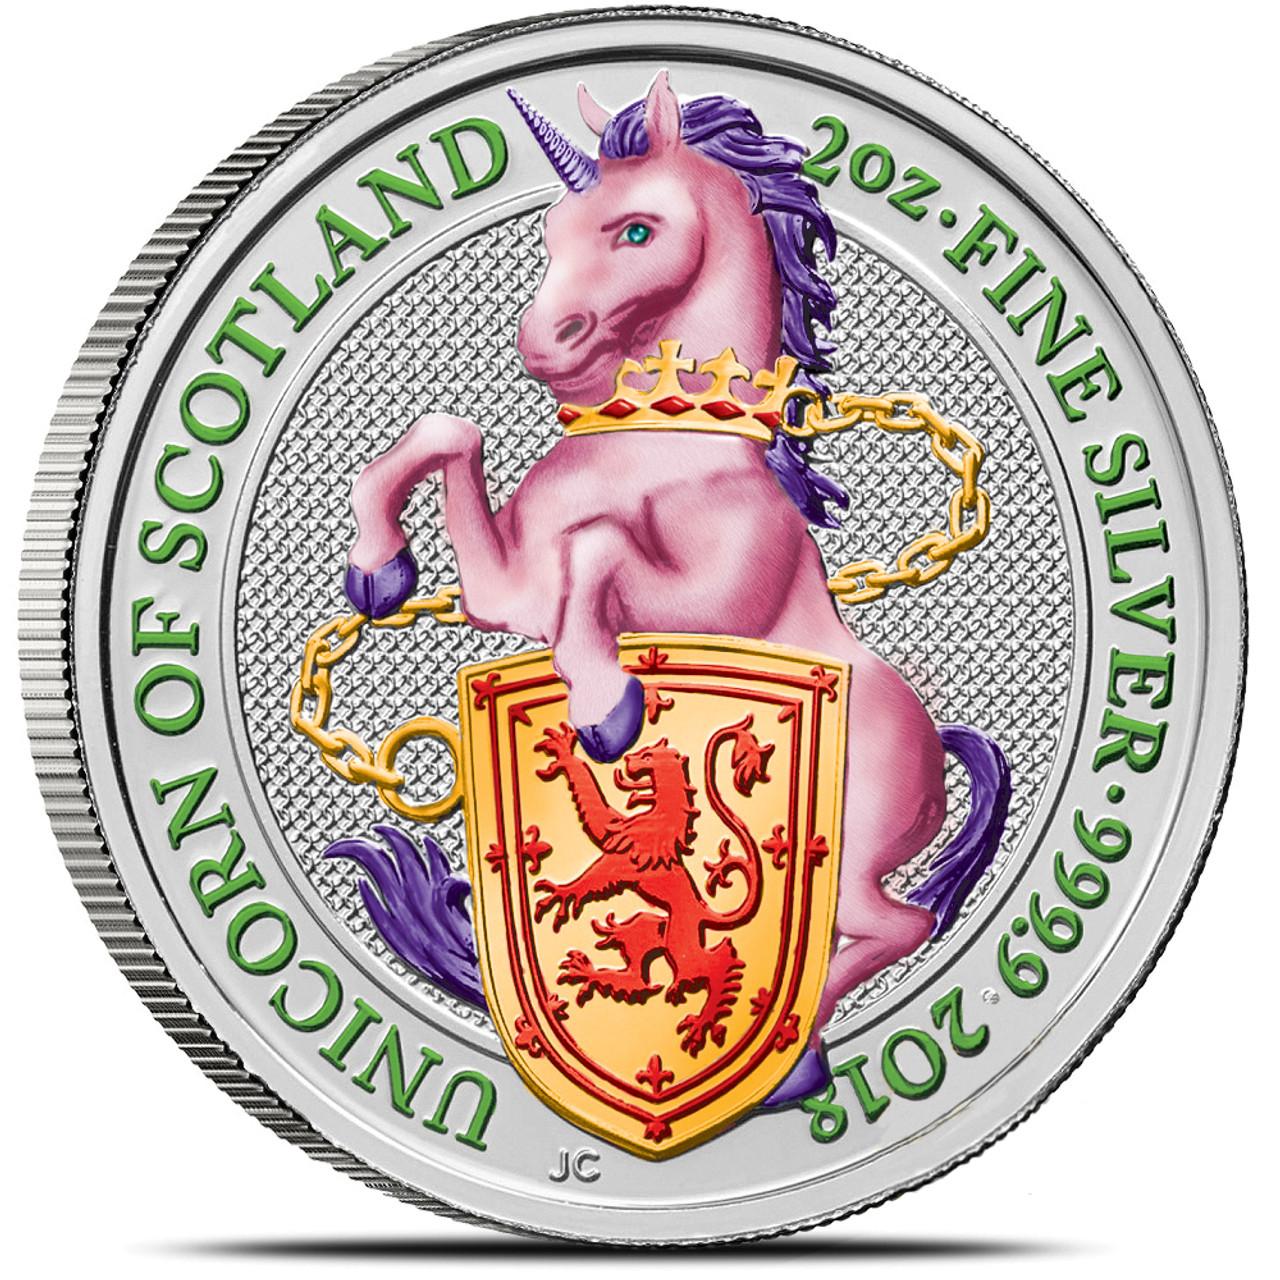 2018 2 Oz Silver £5 QUEEN/'S BEAST UNICORN Coin.